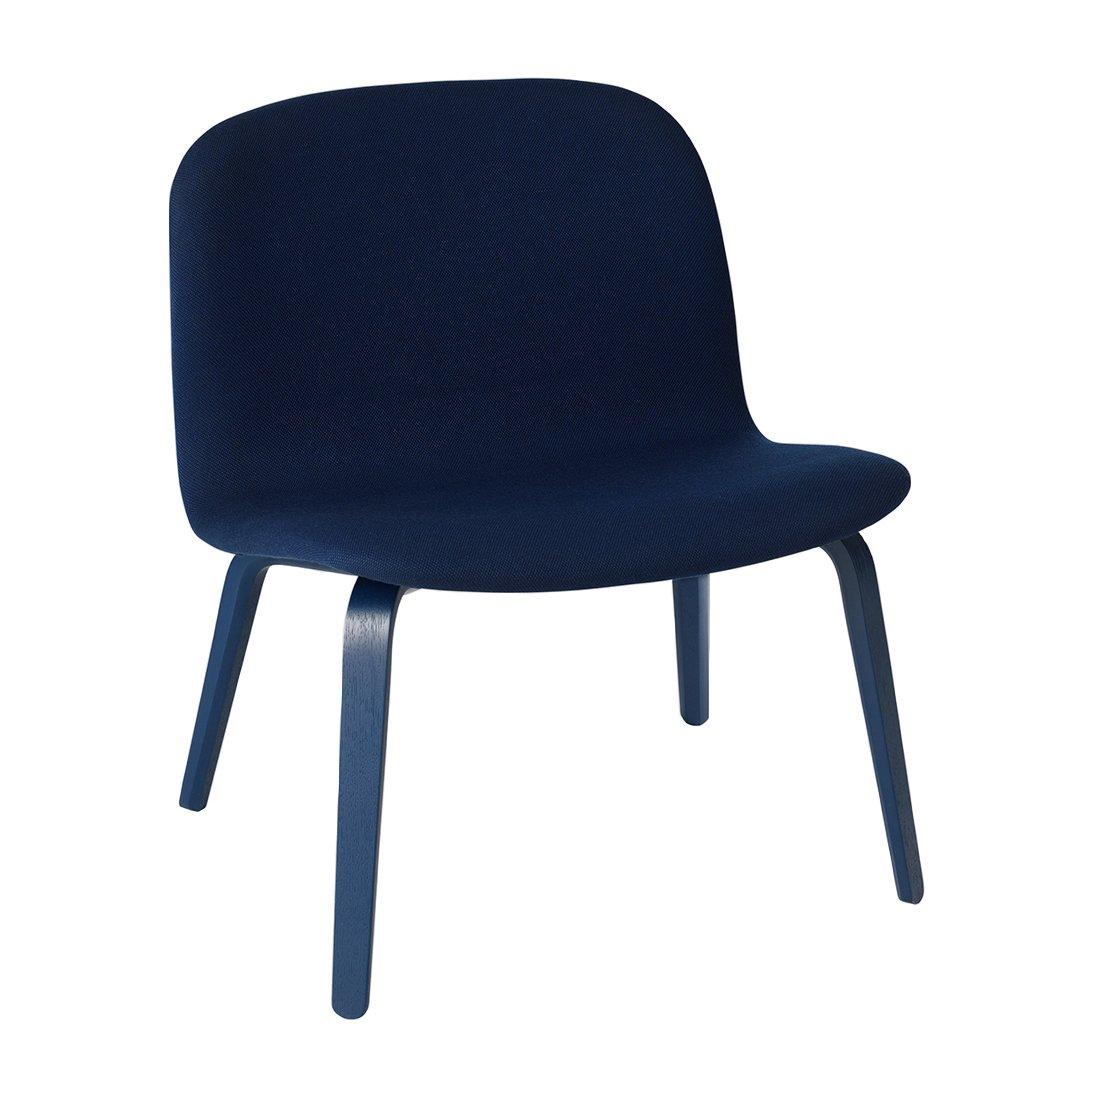 Muuto Visu Loungechair Steelcut 775 Donkerblauw Onderstel